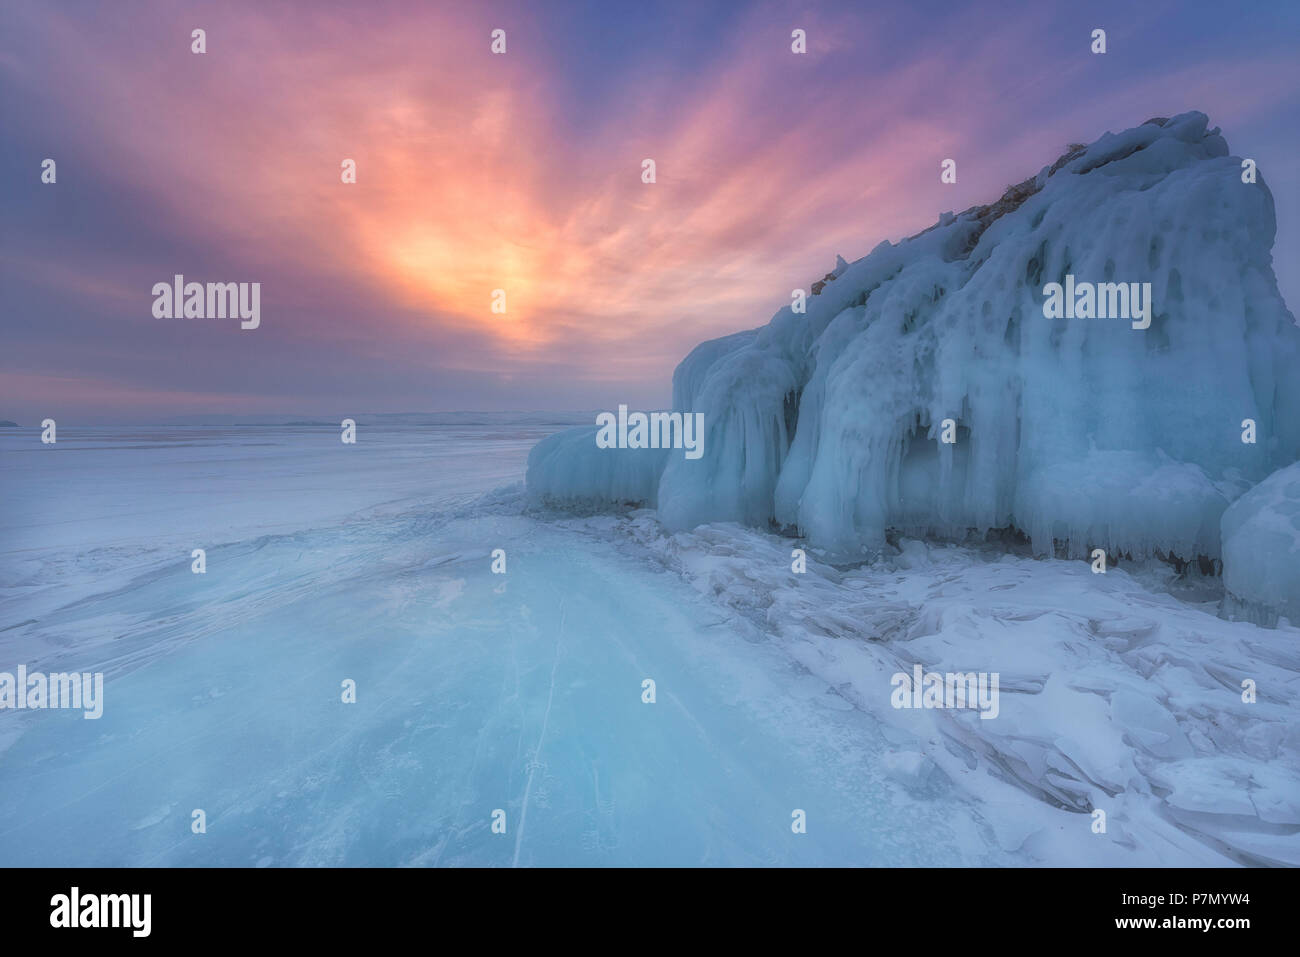 Ice mountain at sunrise at lake Baikal, Irkutsk region, Siberia, Russia - Stock Image